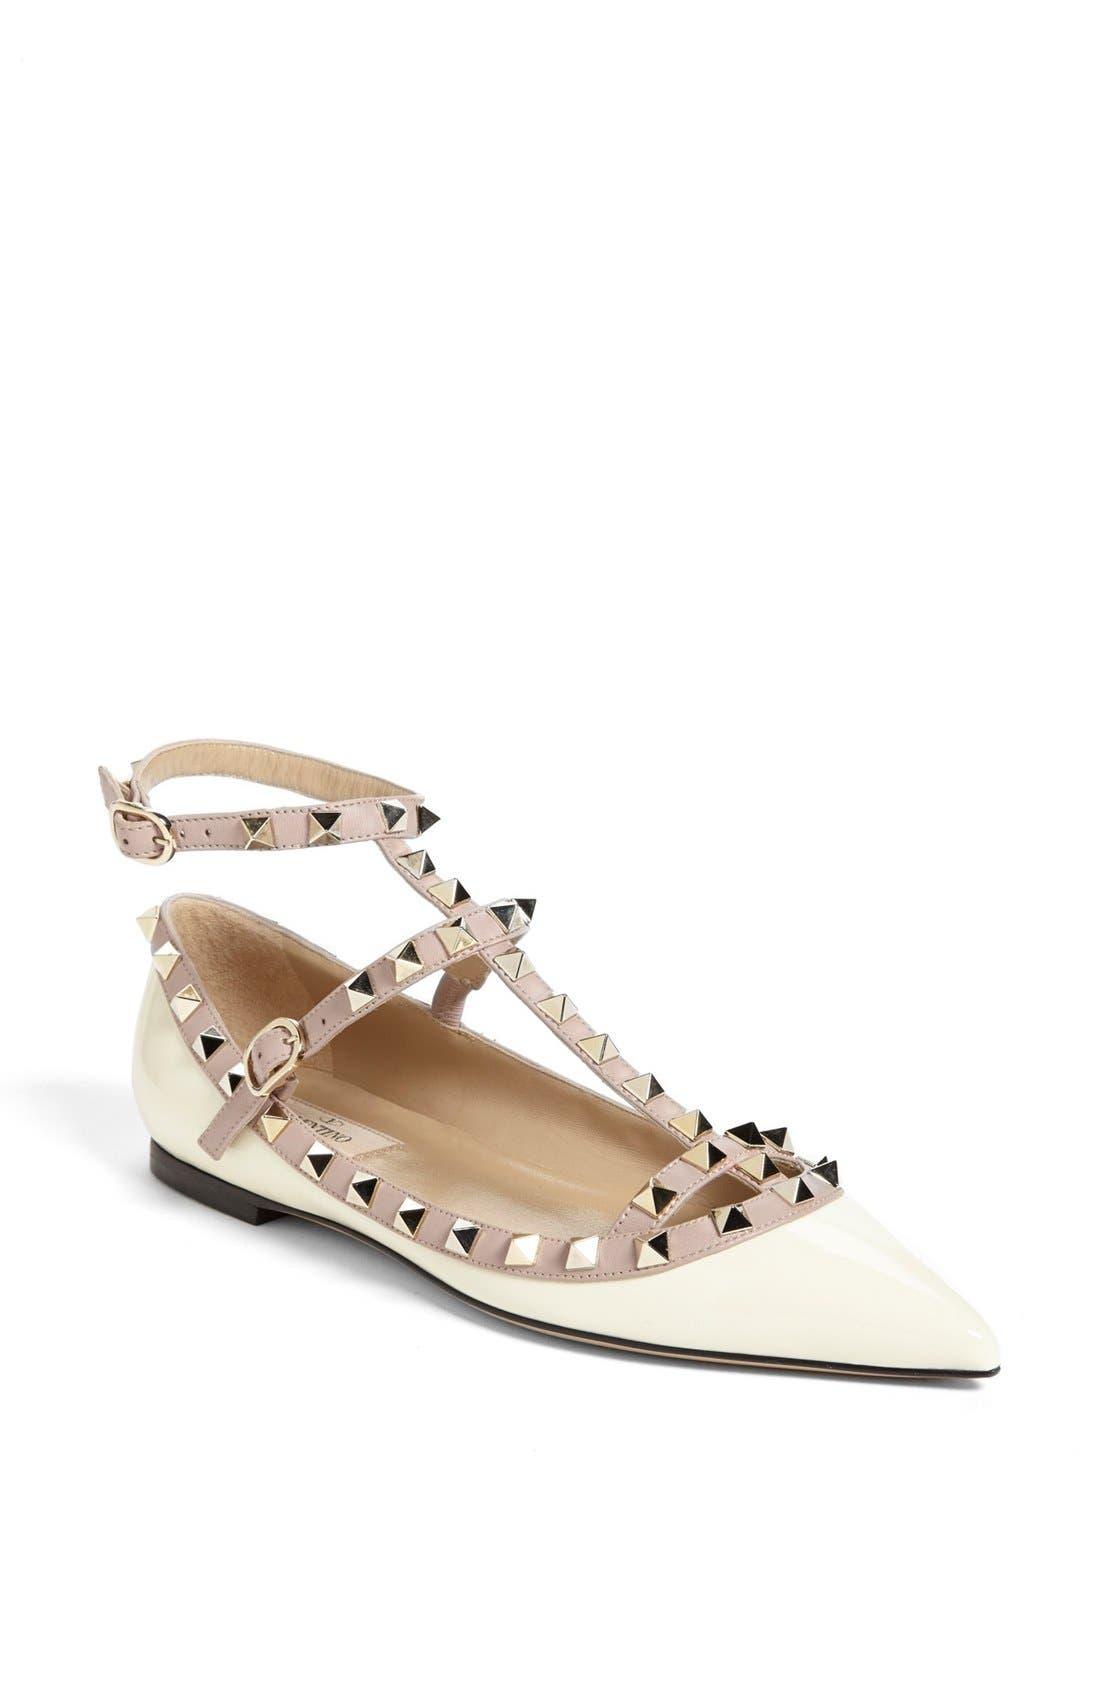 Alternate Image 1 Selected - VALENTINO GARAVANI 'Rockstud' Double Ankle Strap Ballet Flat